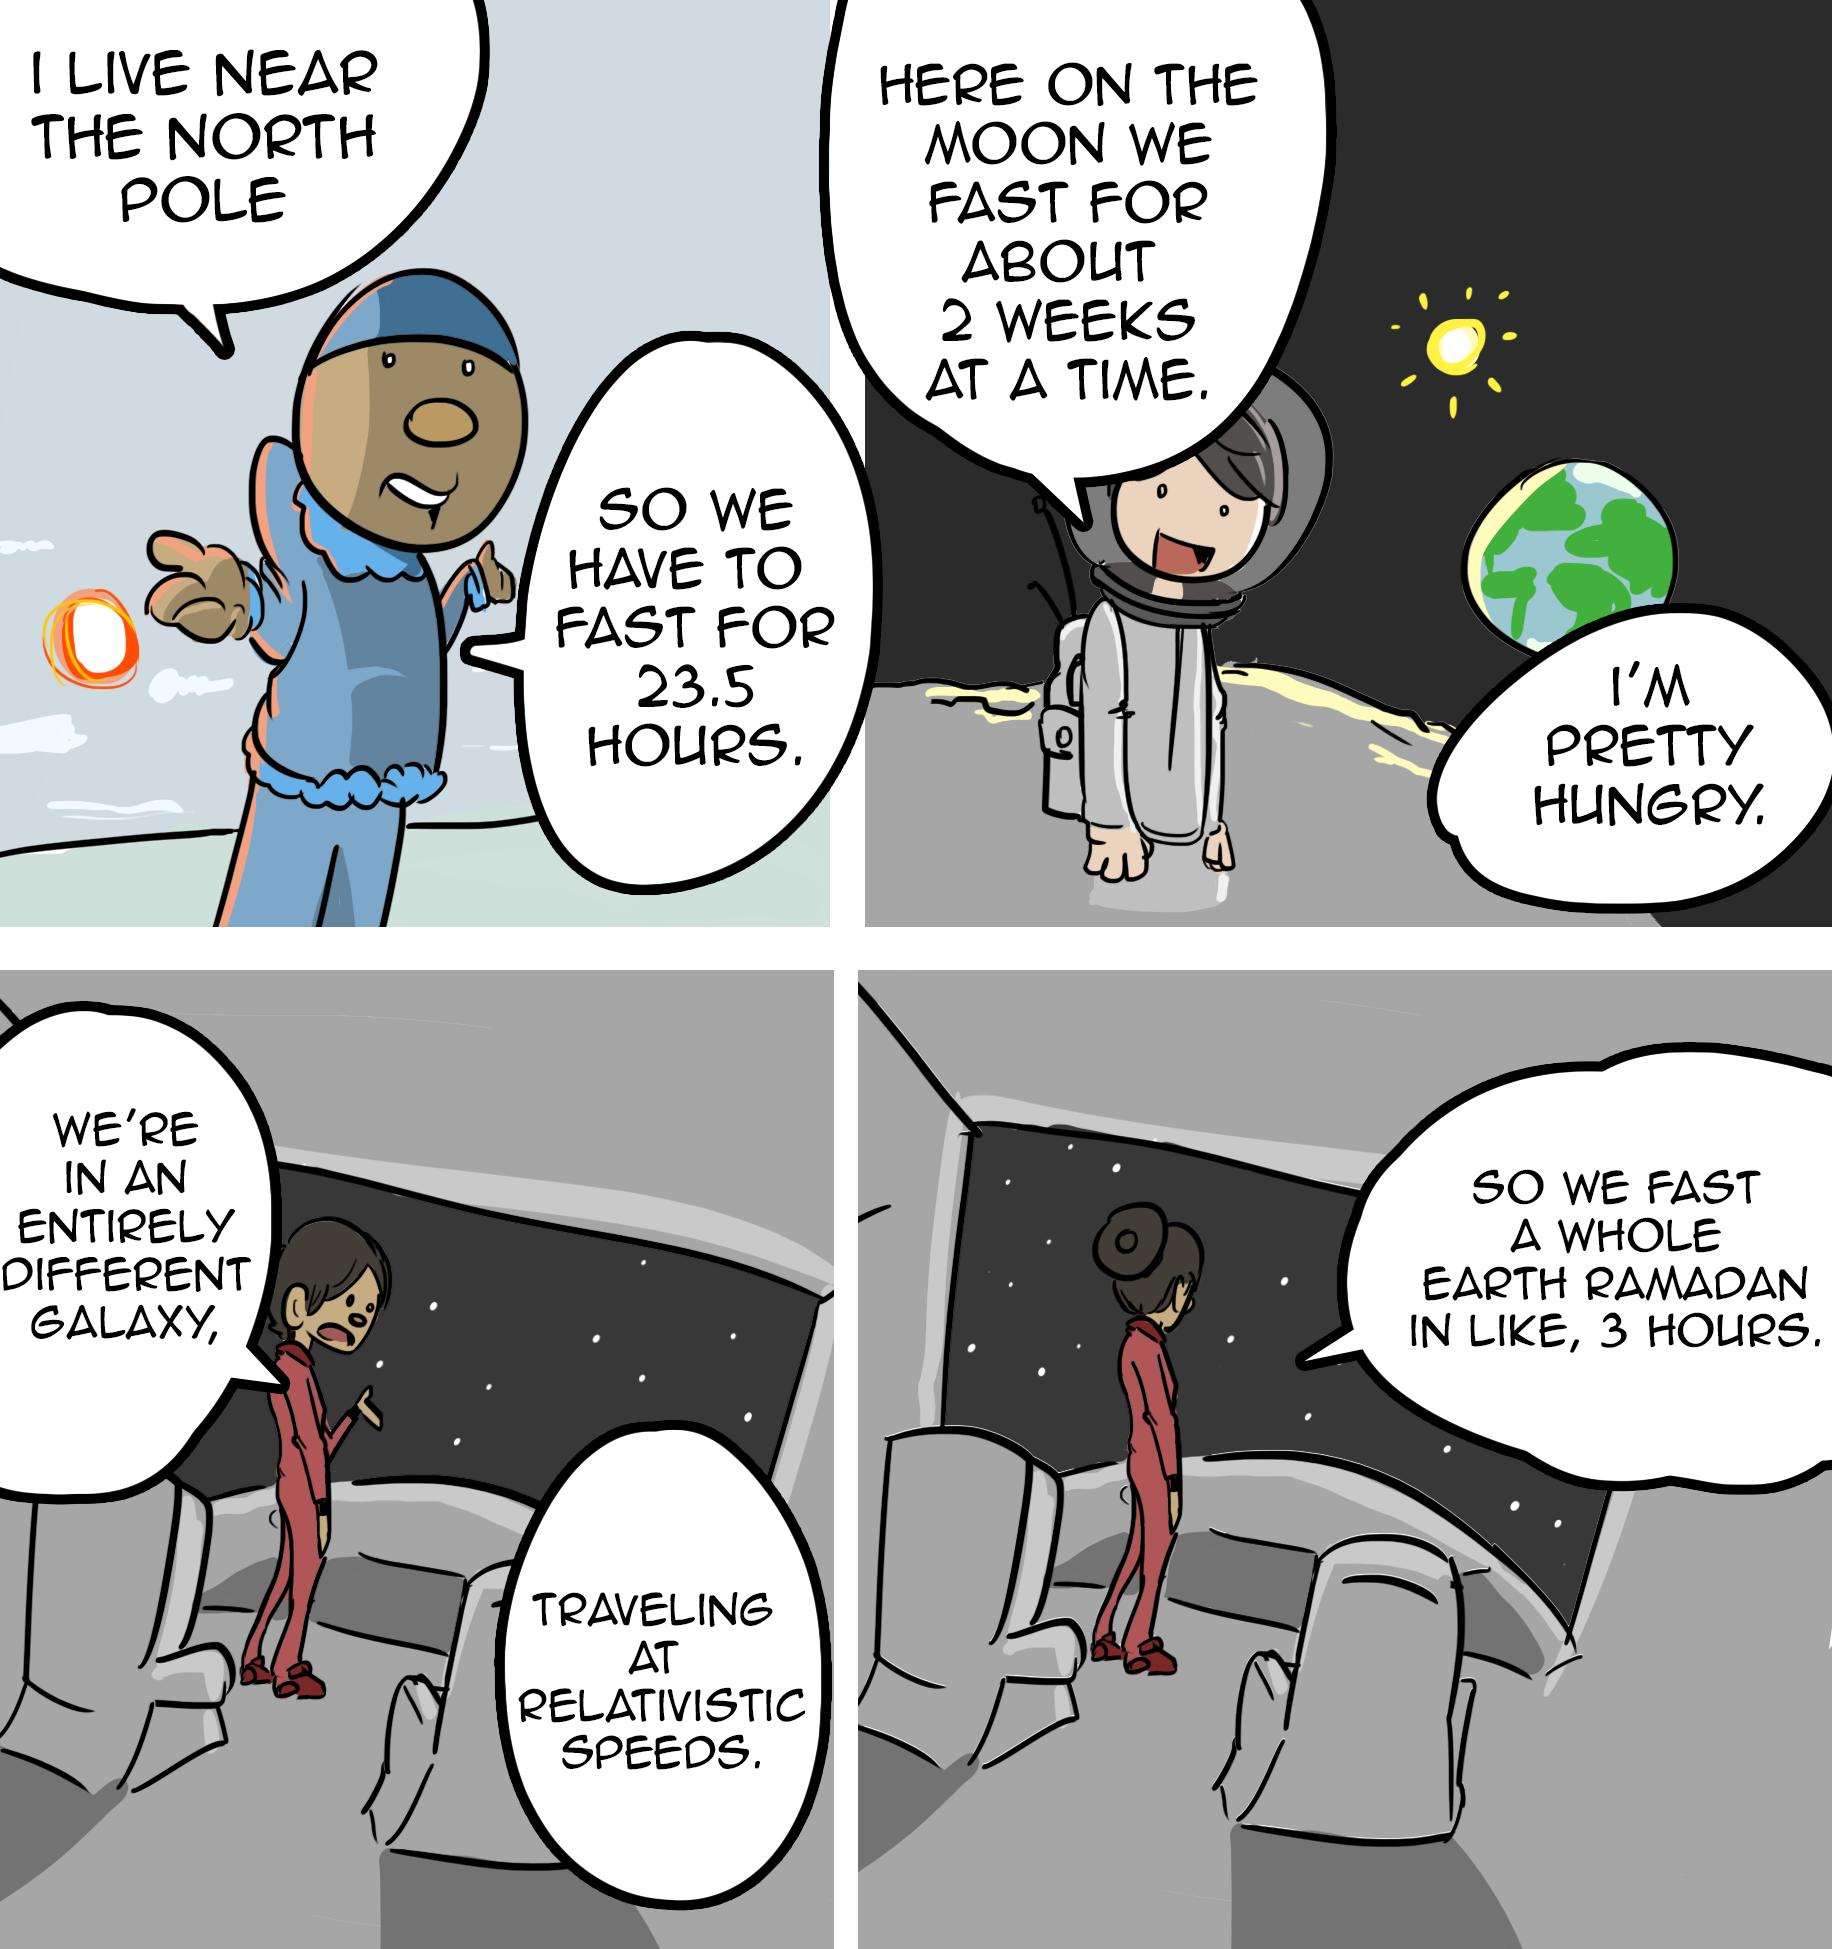 ramadan in space.png